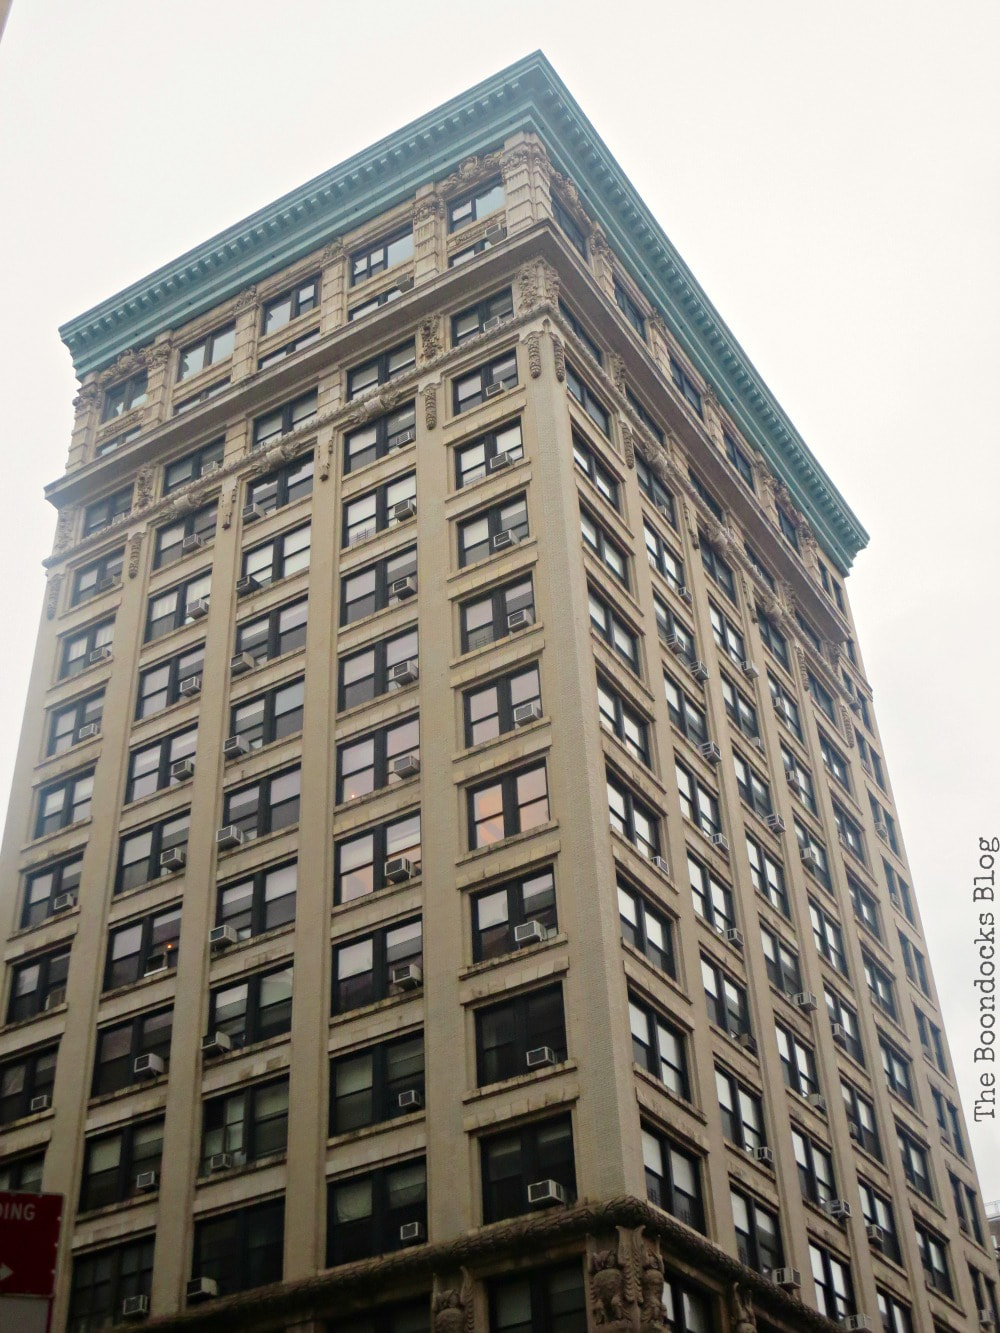 Striking building on Broadway, Interesting things to see in Greenwich Village www.theboondocksblog.com